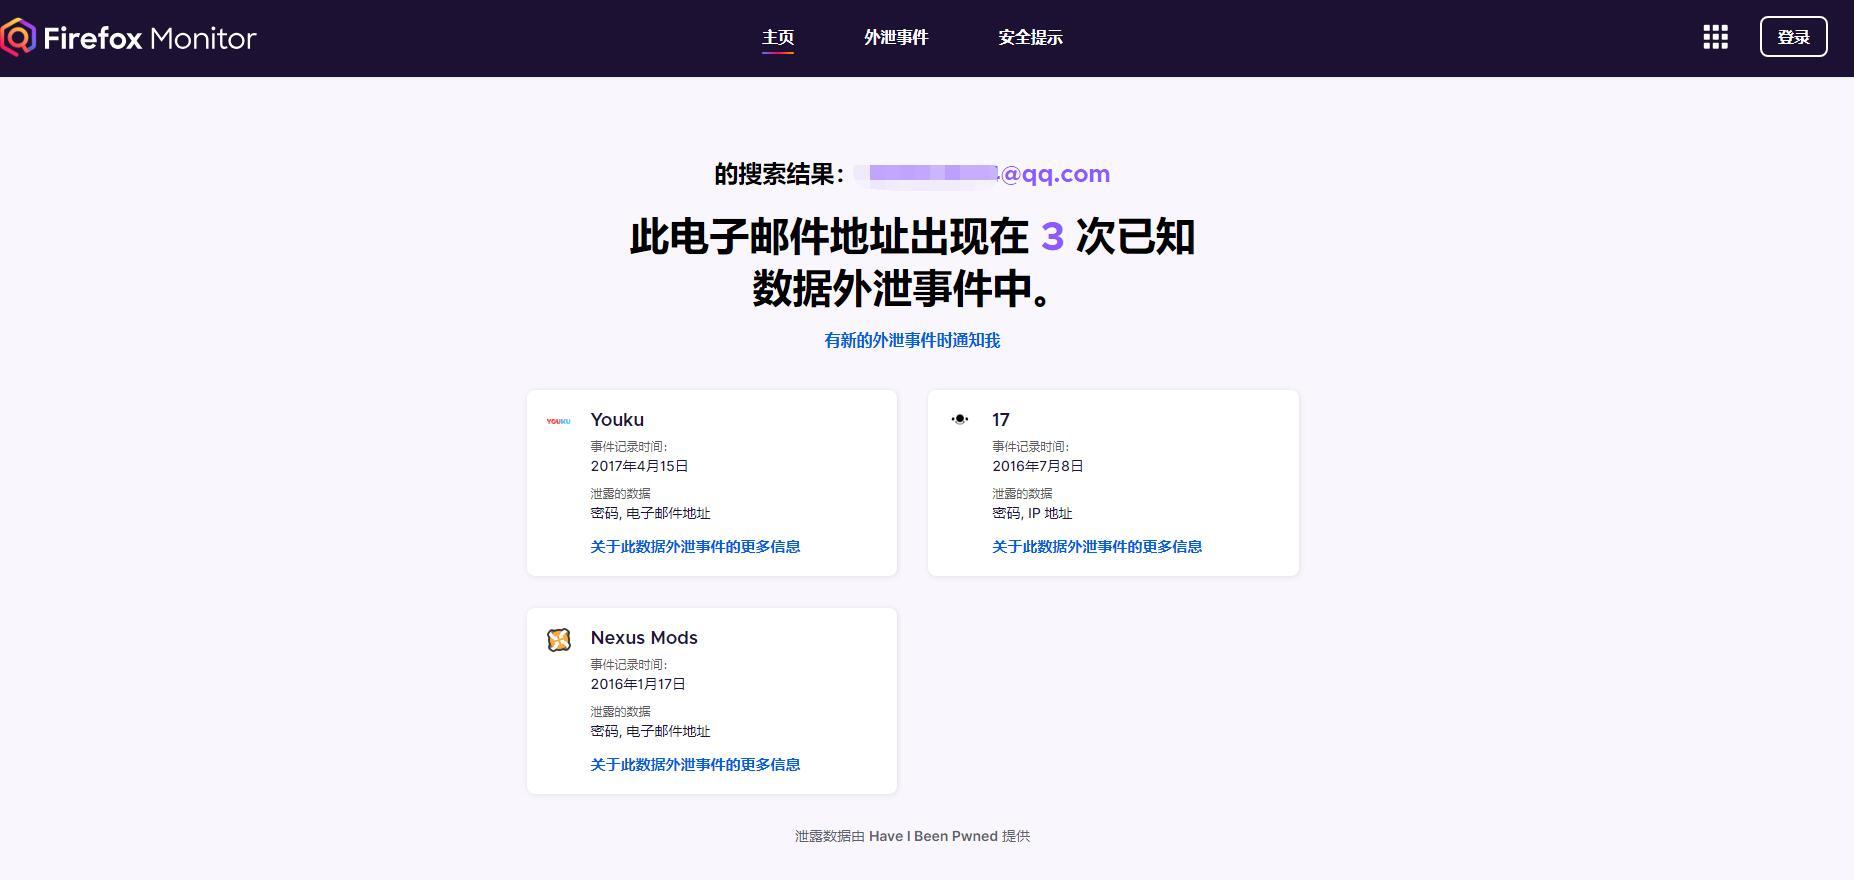 Firefox monitor - 在线查账号数据是否有外泄